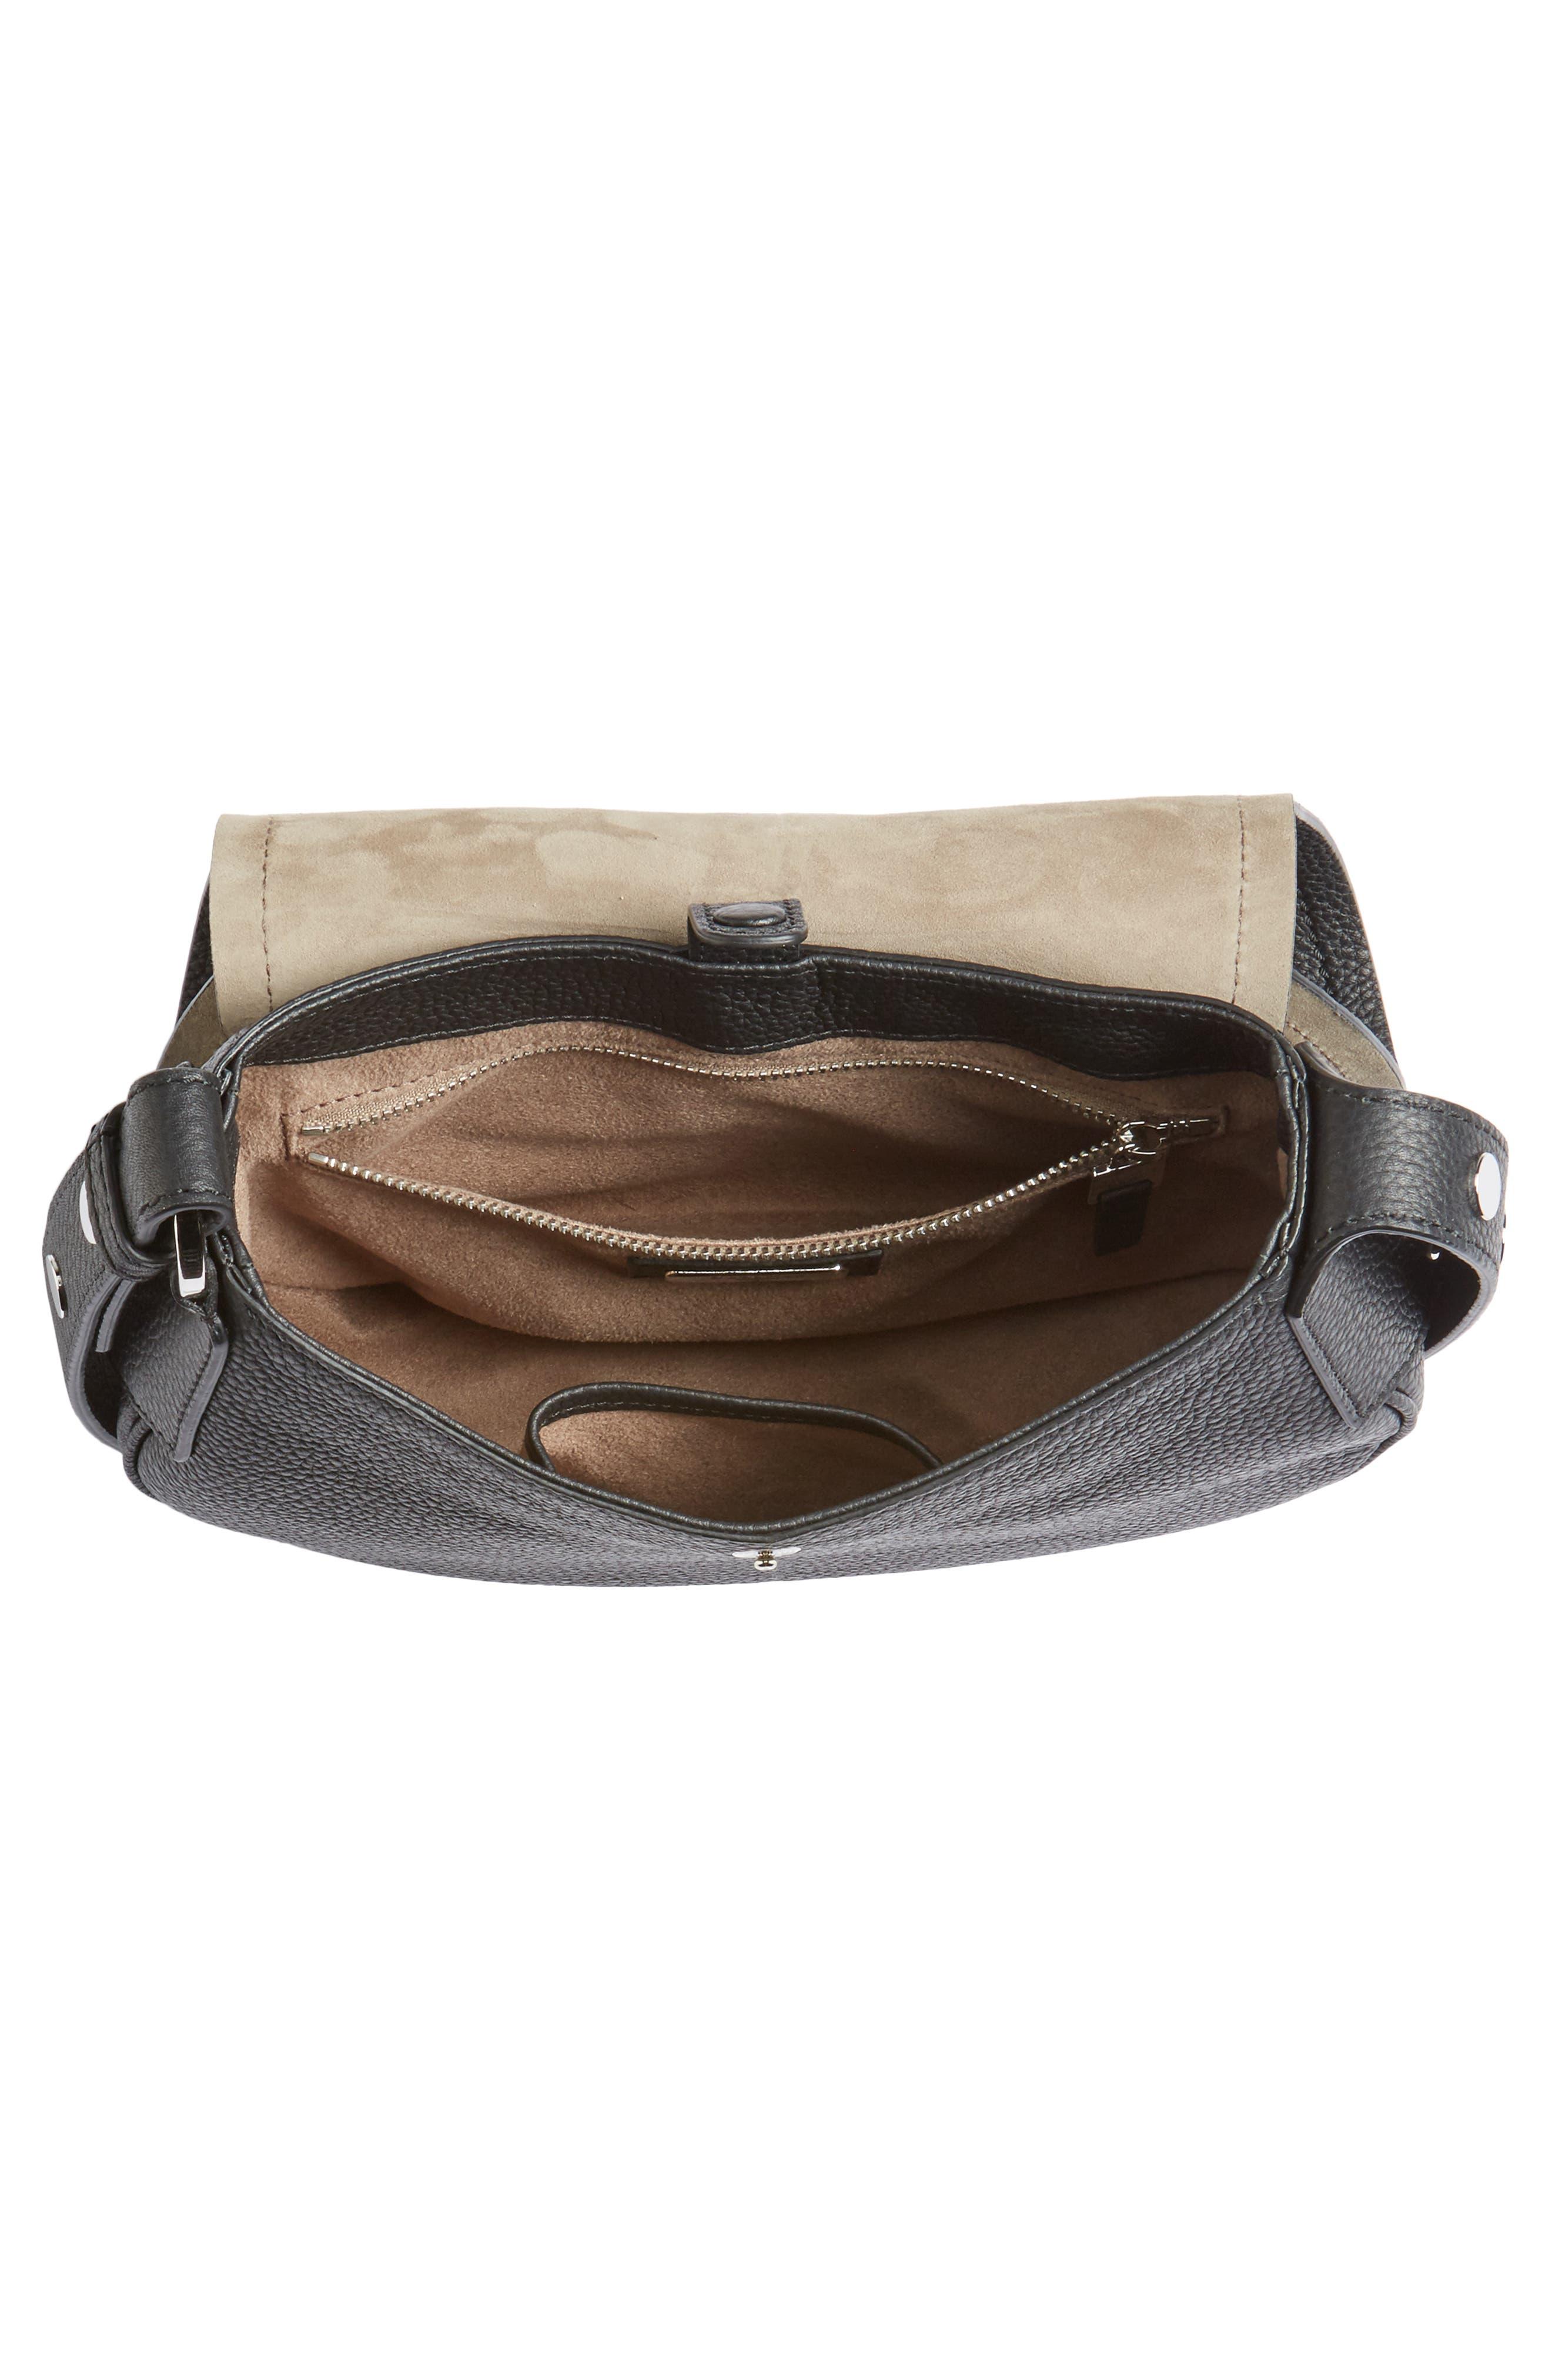 Mini Valeria Cachemire Leather Crossbody Bag,                             Alternate thumbnail 4, color,                             001